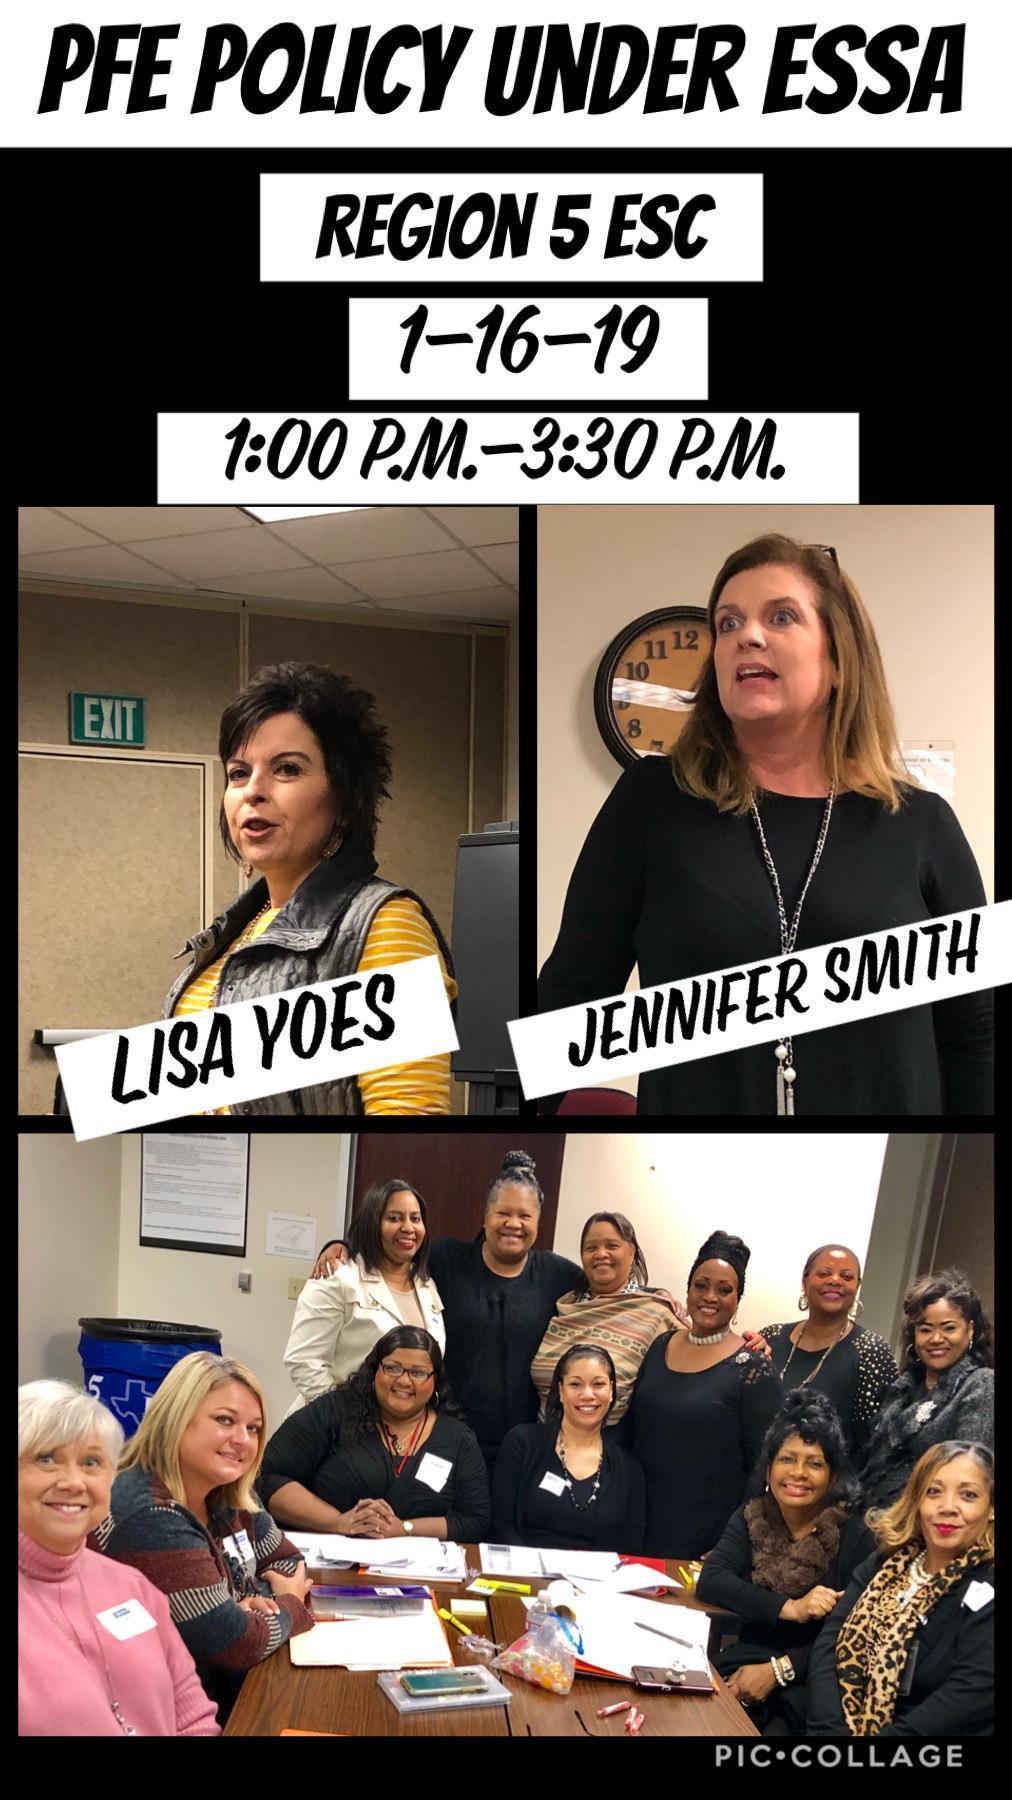 Lisa Yoes and Jennifer Smith, Region 5 ESC